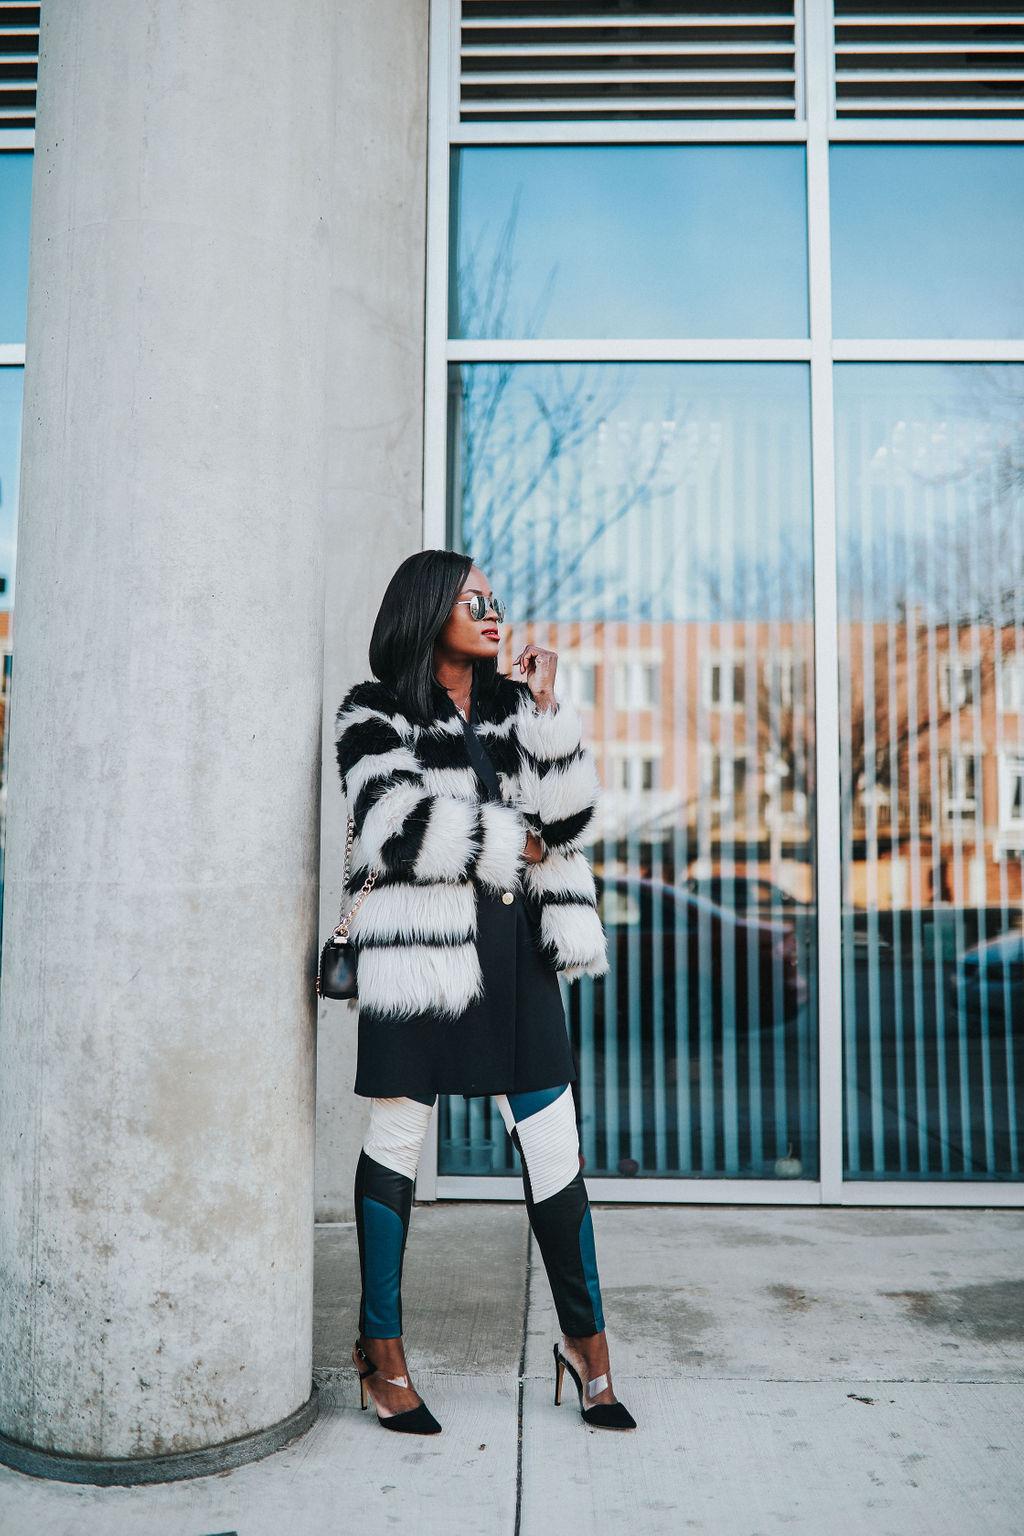 Black and white fur coat